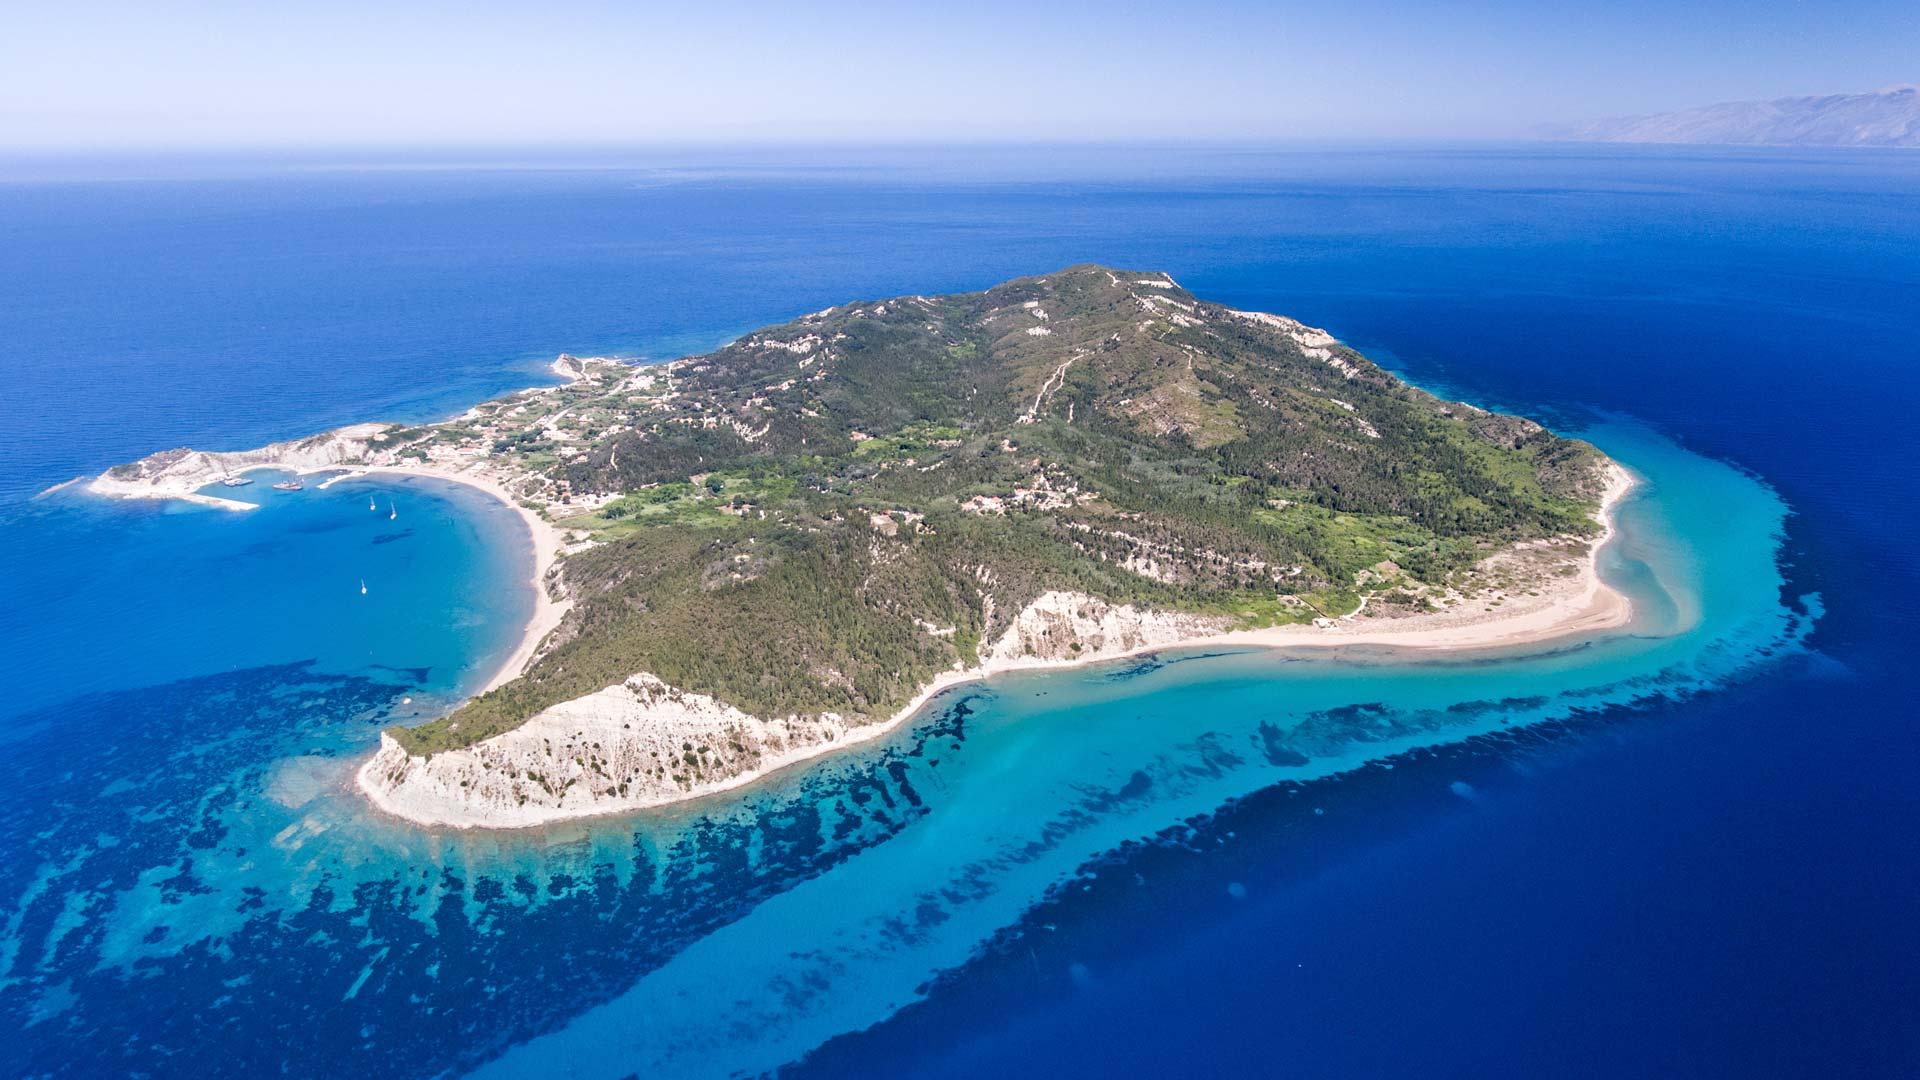 hotelerikousa erikousa island aerial drone slider image 3